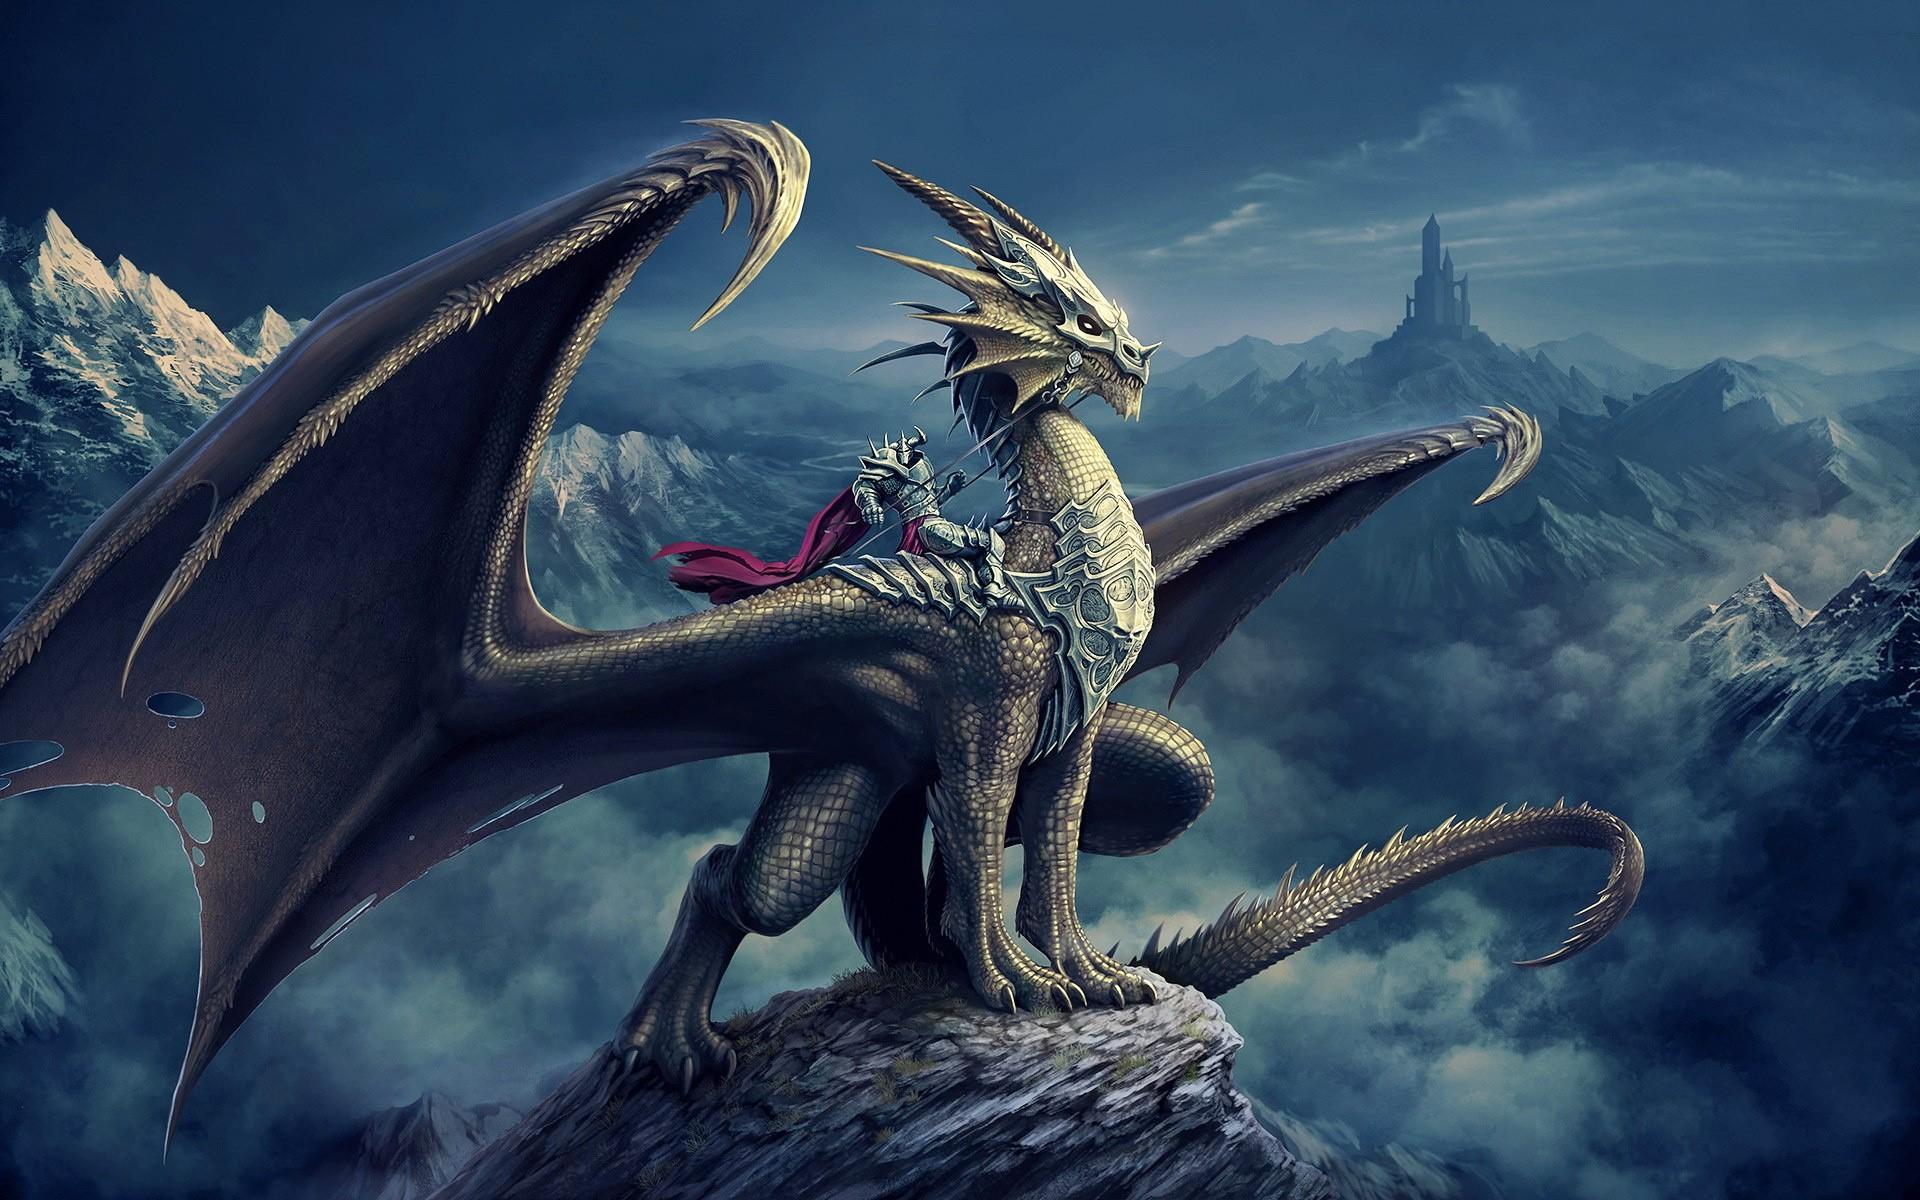 Dragons wallpapers hd fantasy dragon wallpaper voltagebd Choice Image